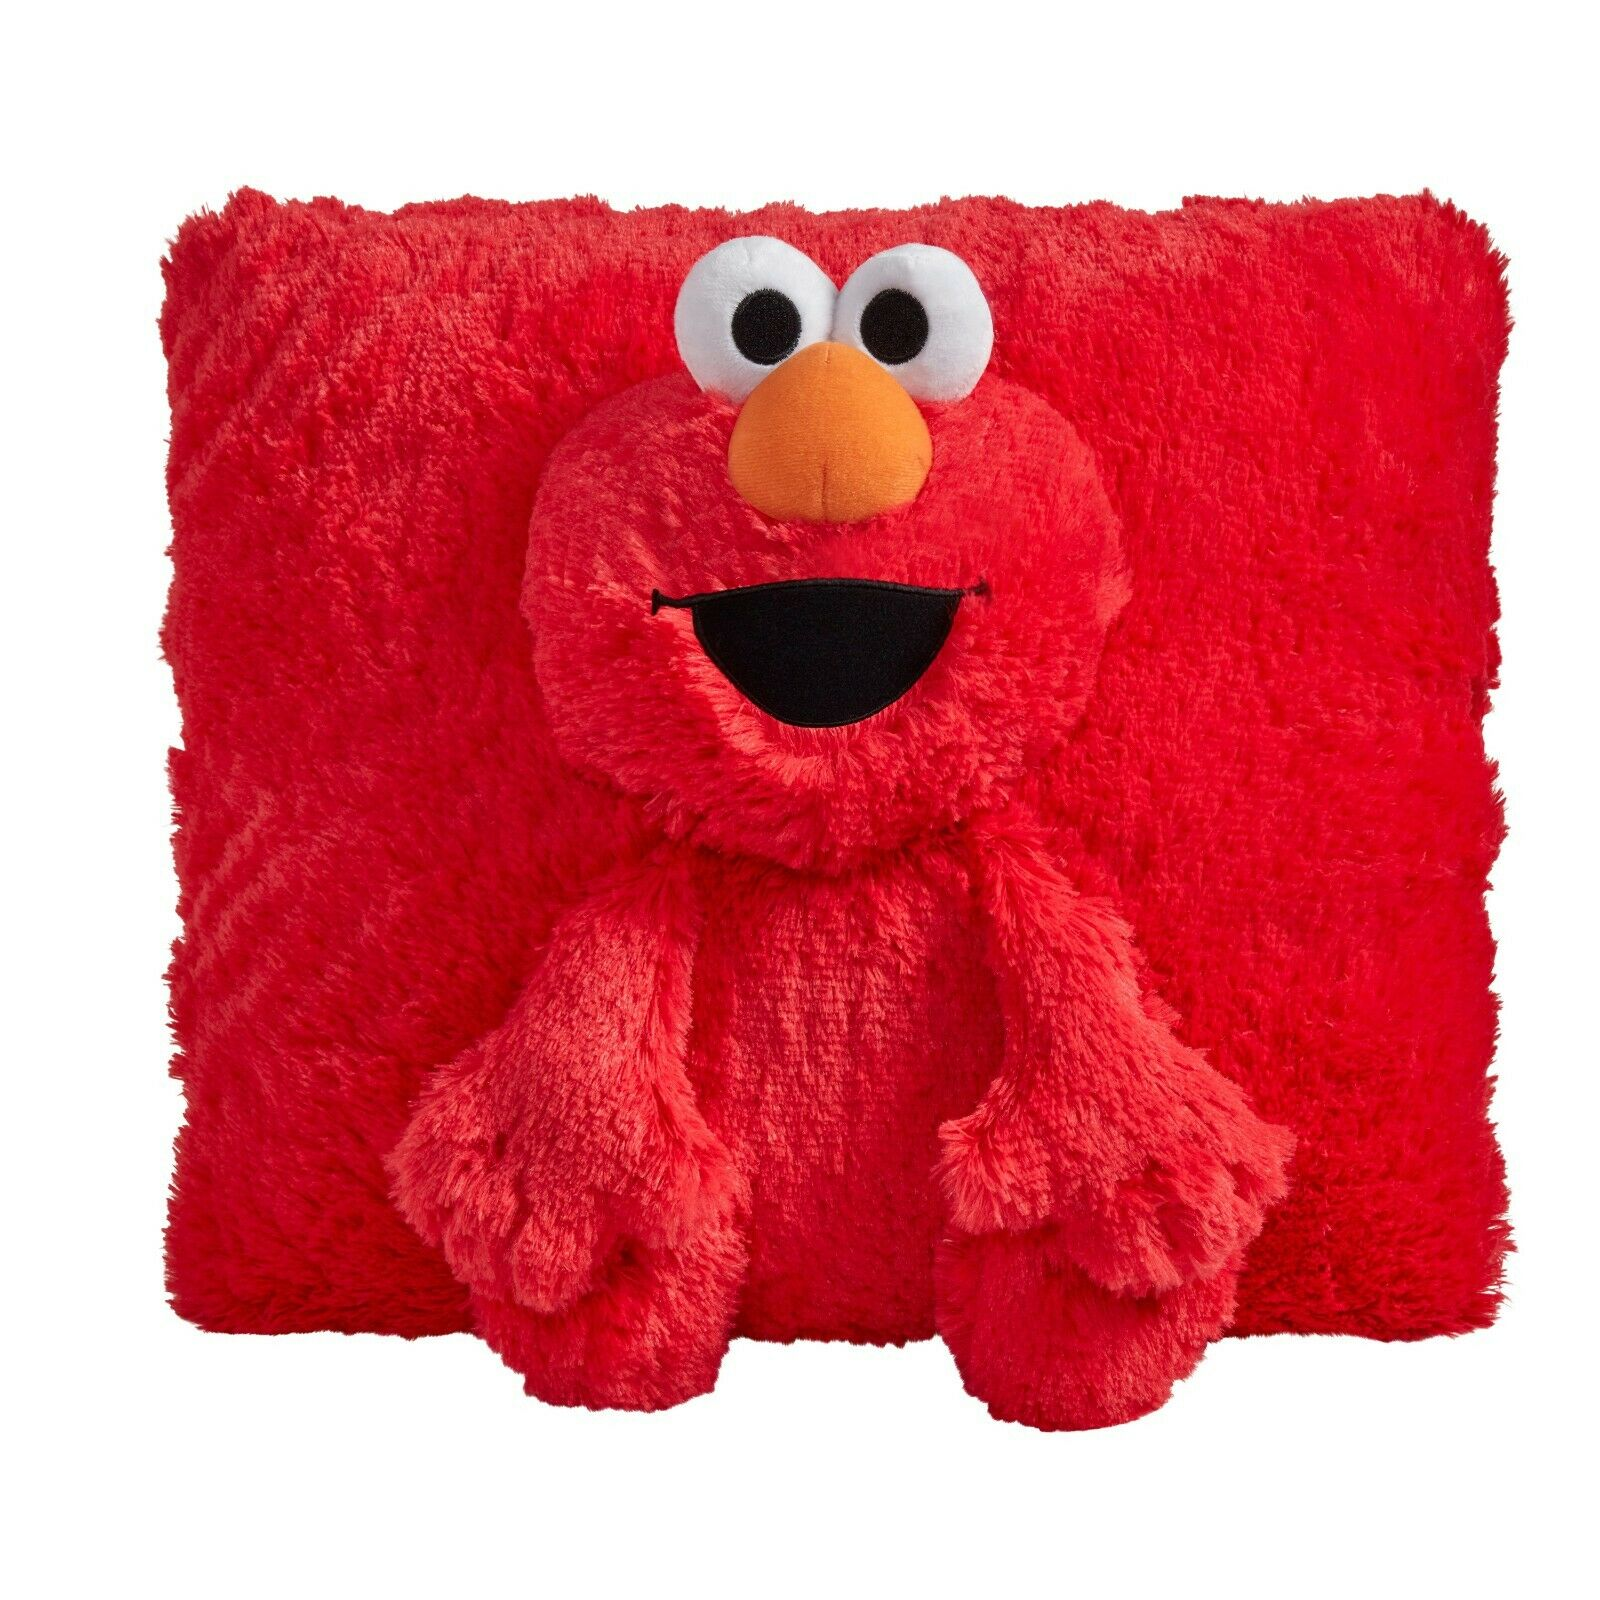 Pillow Pets Sesame Street Elmo Stuffed Animal Stuff Toy